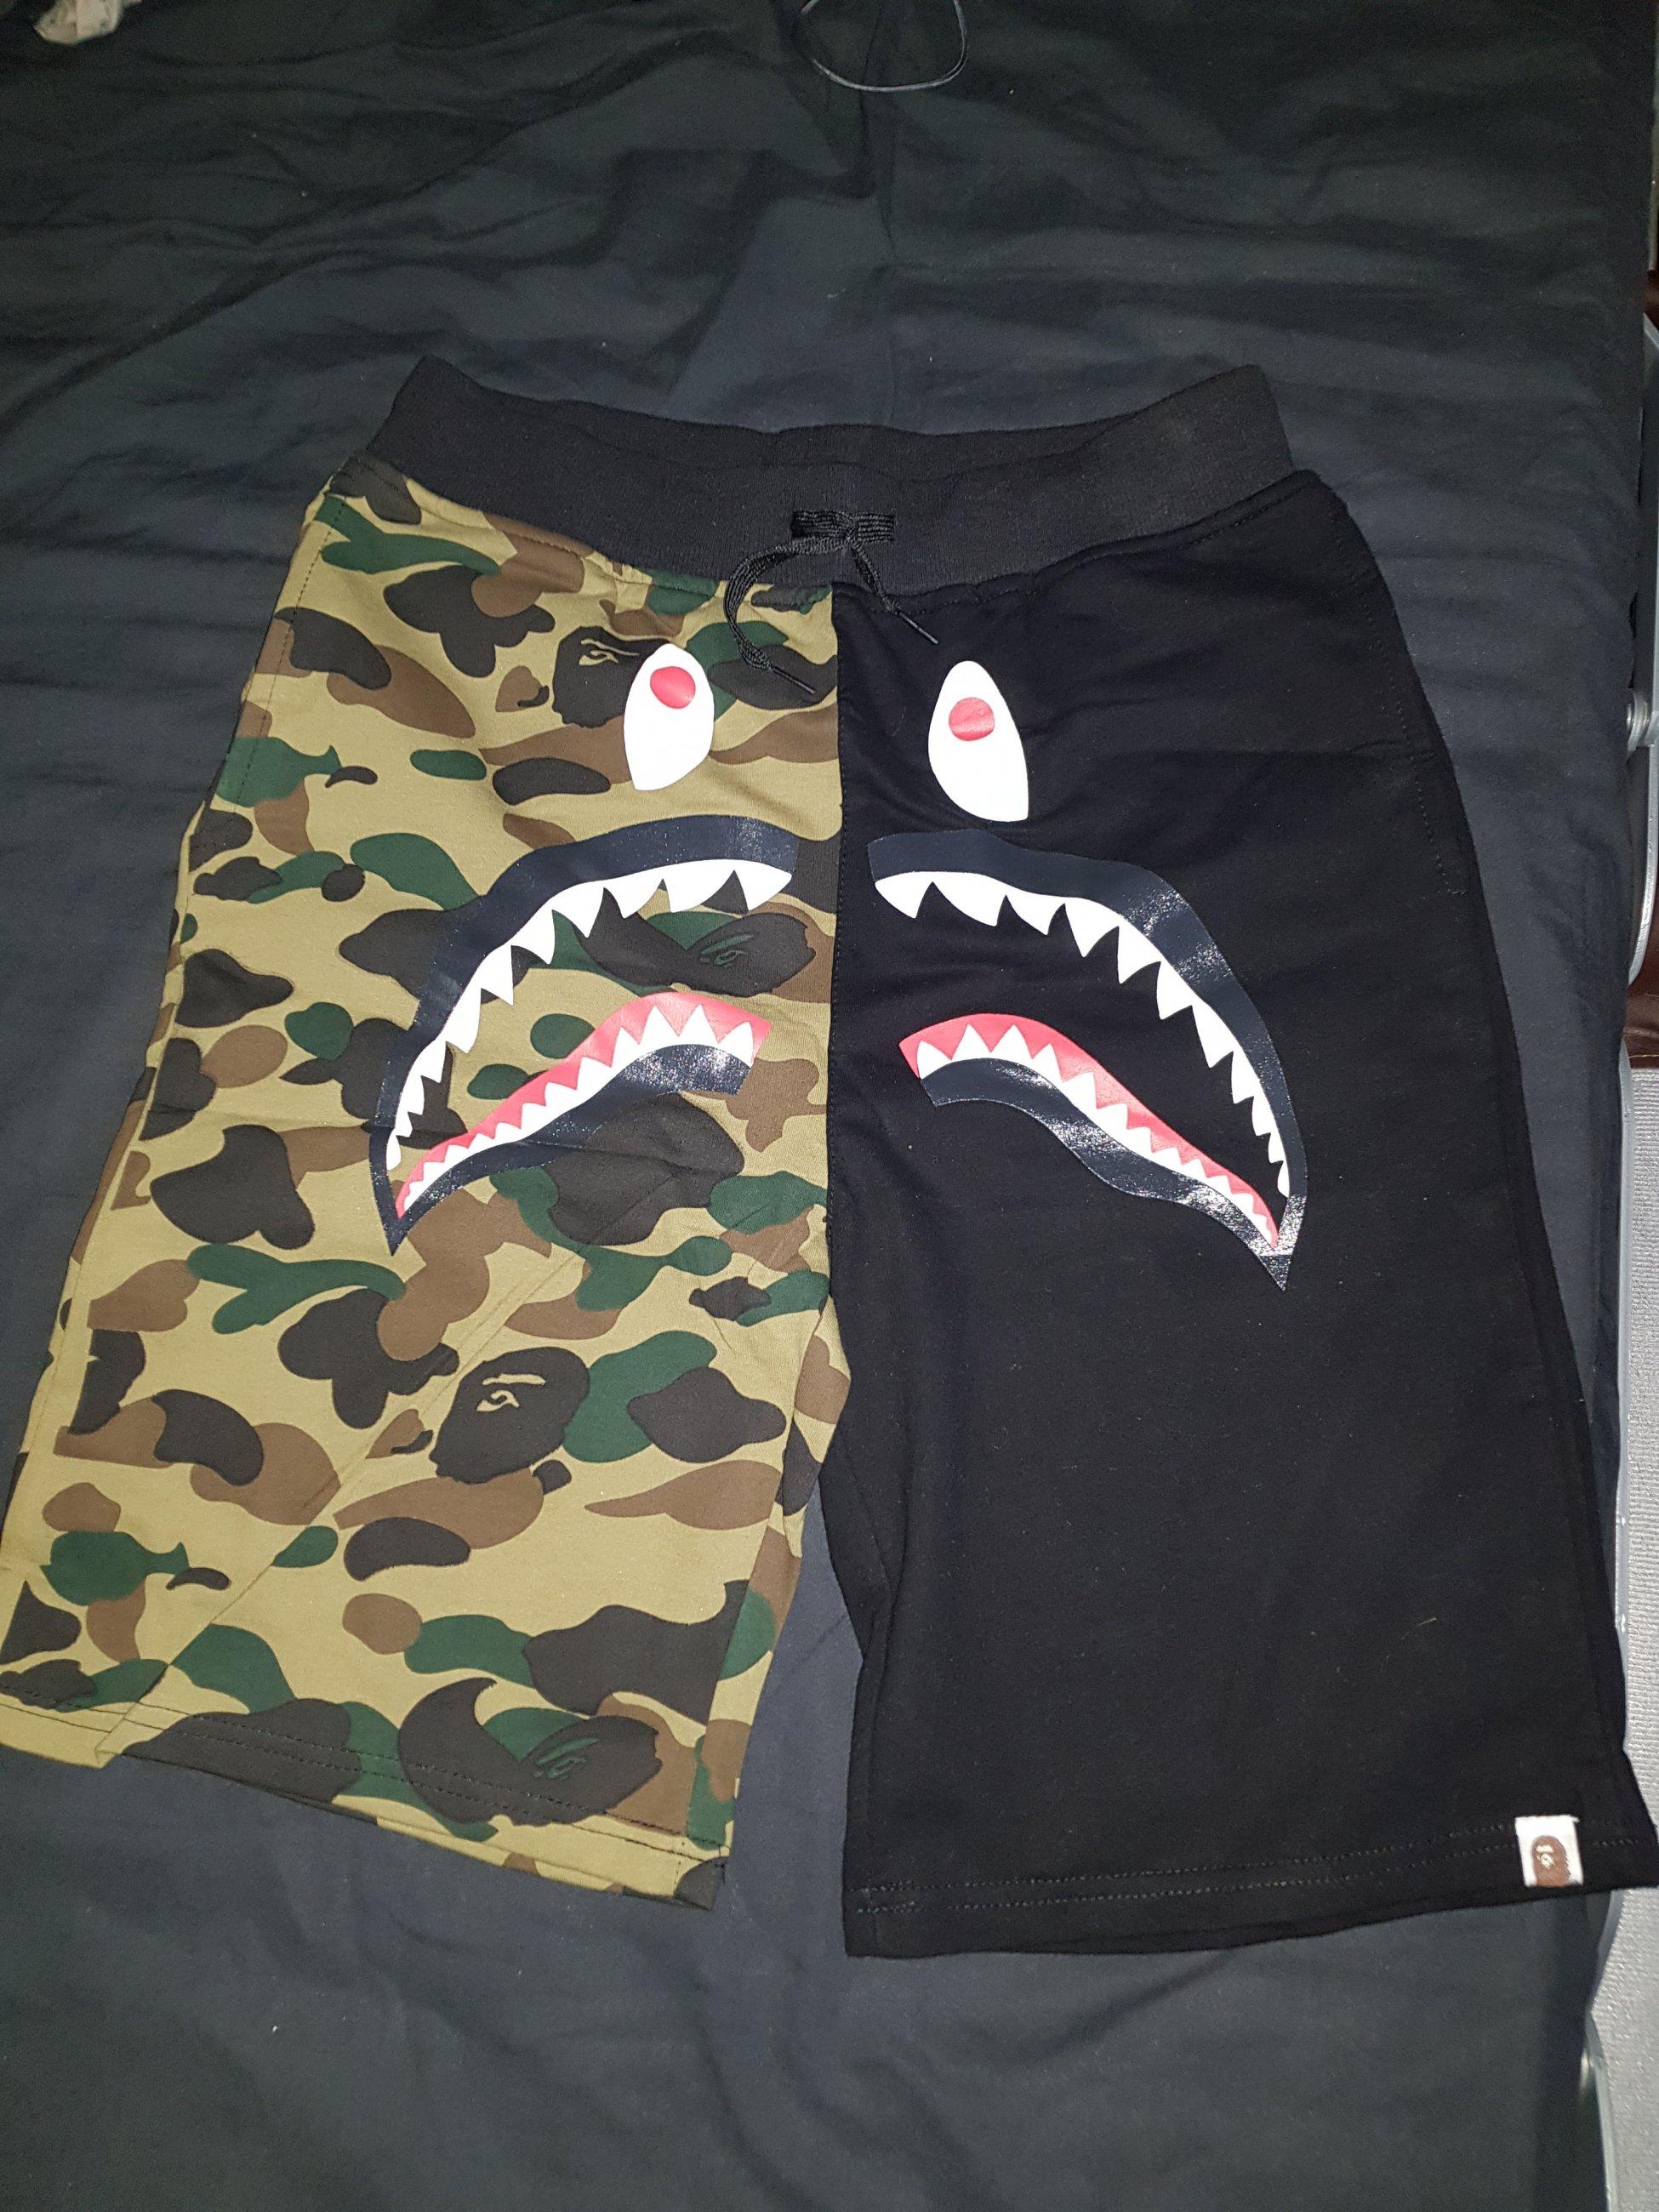 prezzo più basso deb3a f2ae6 Pantaloni Bape - Meetapp